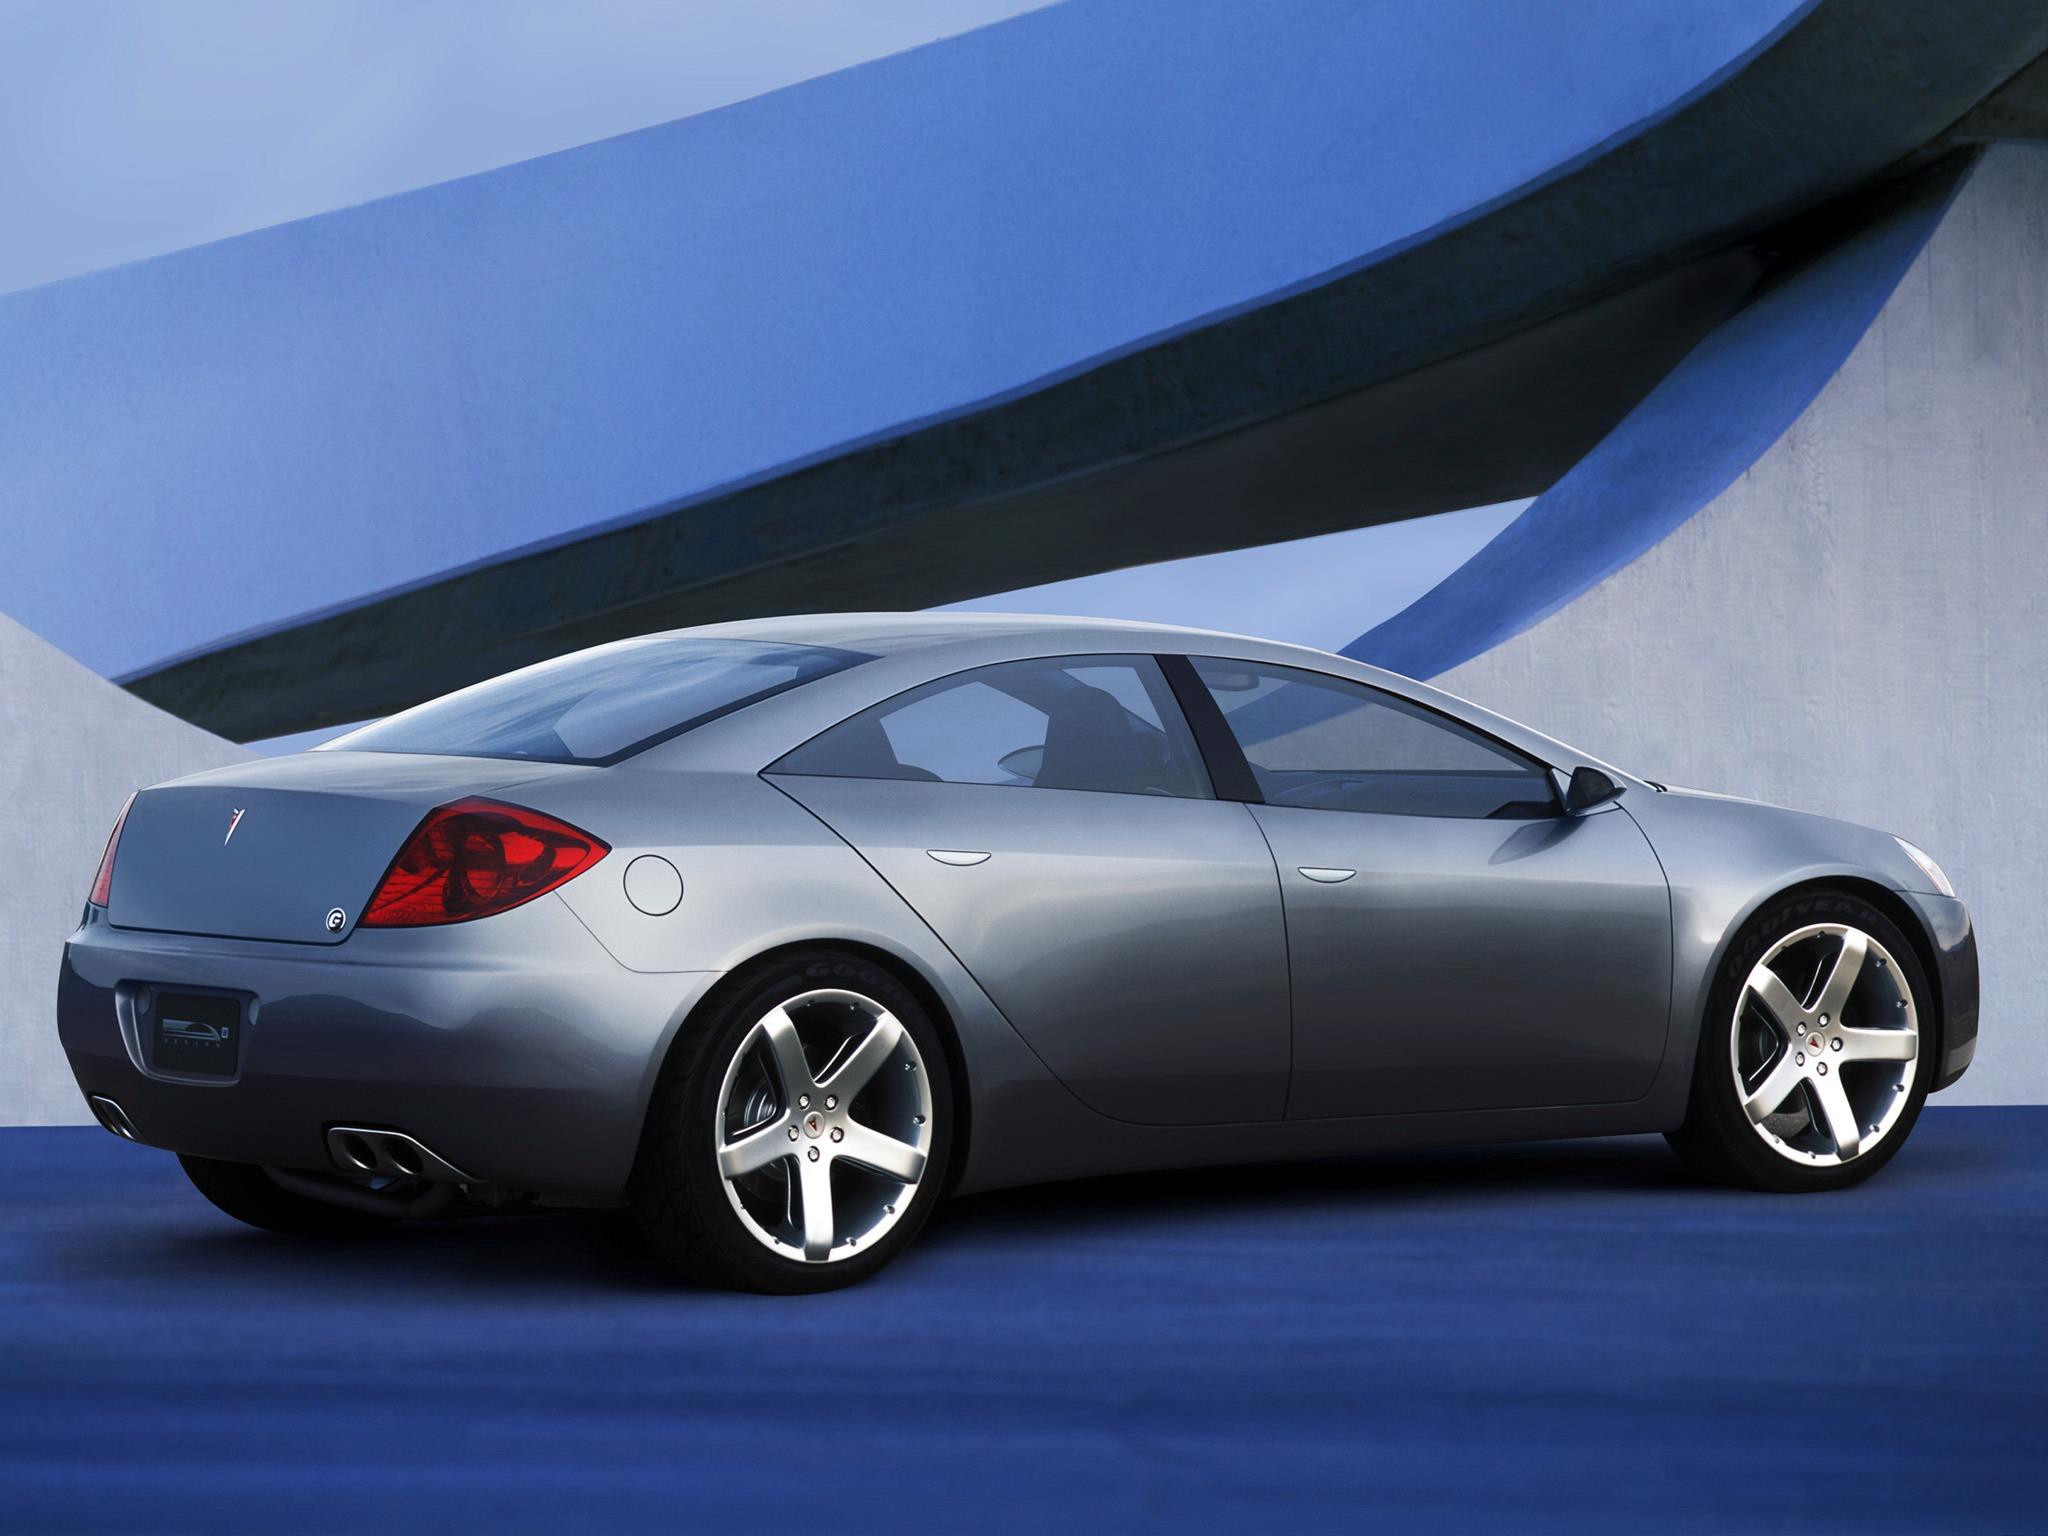 Pontiac G6 Concept 2003 Old Concept Cars